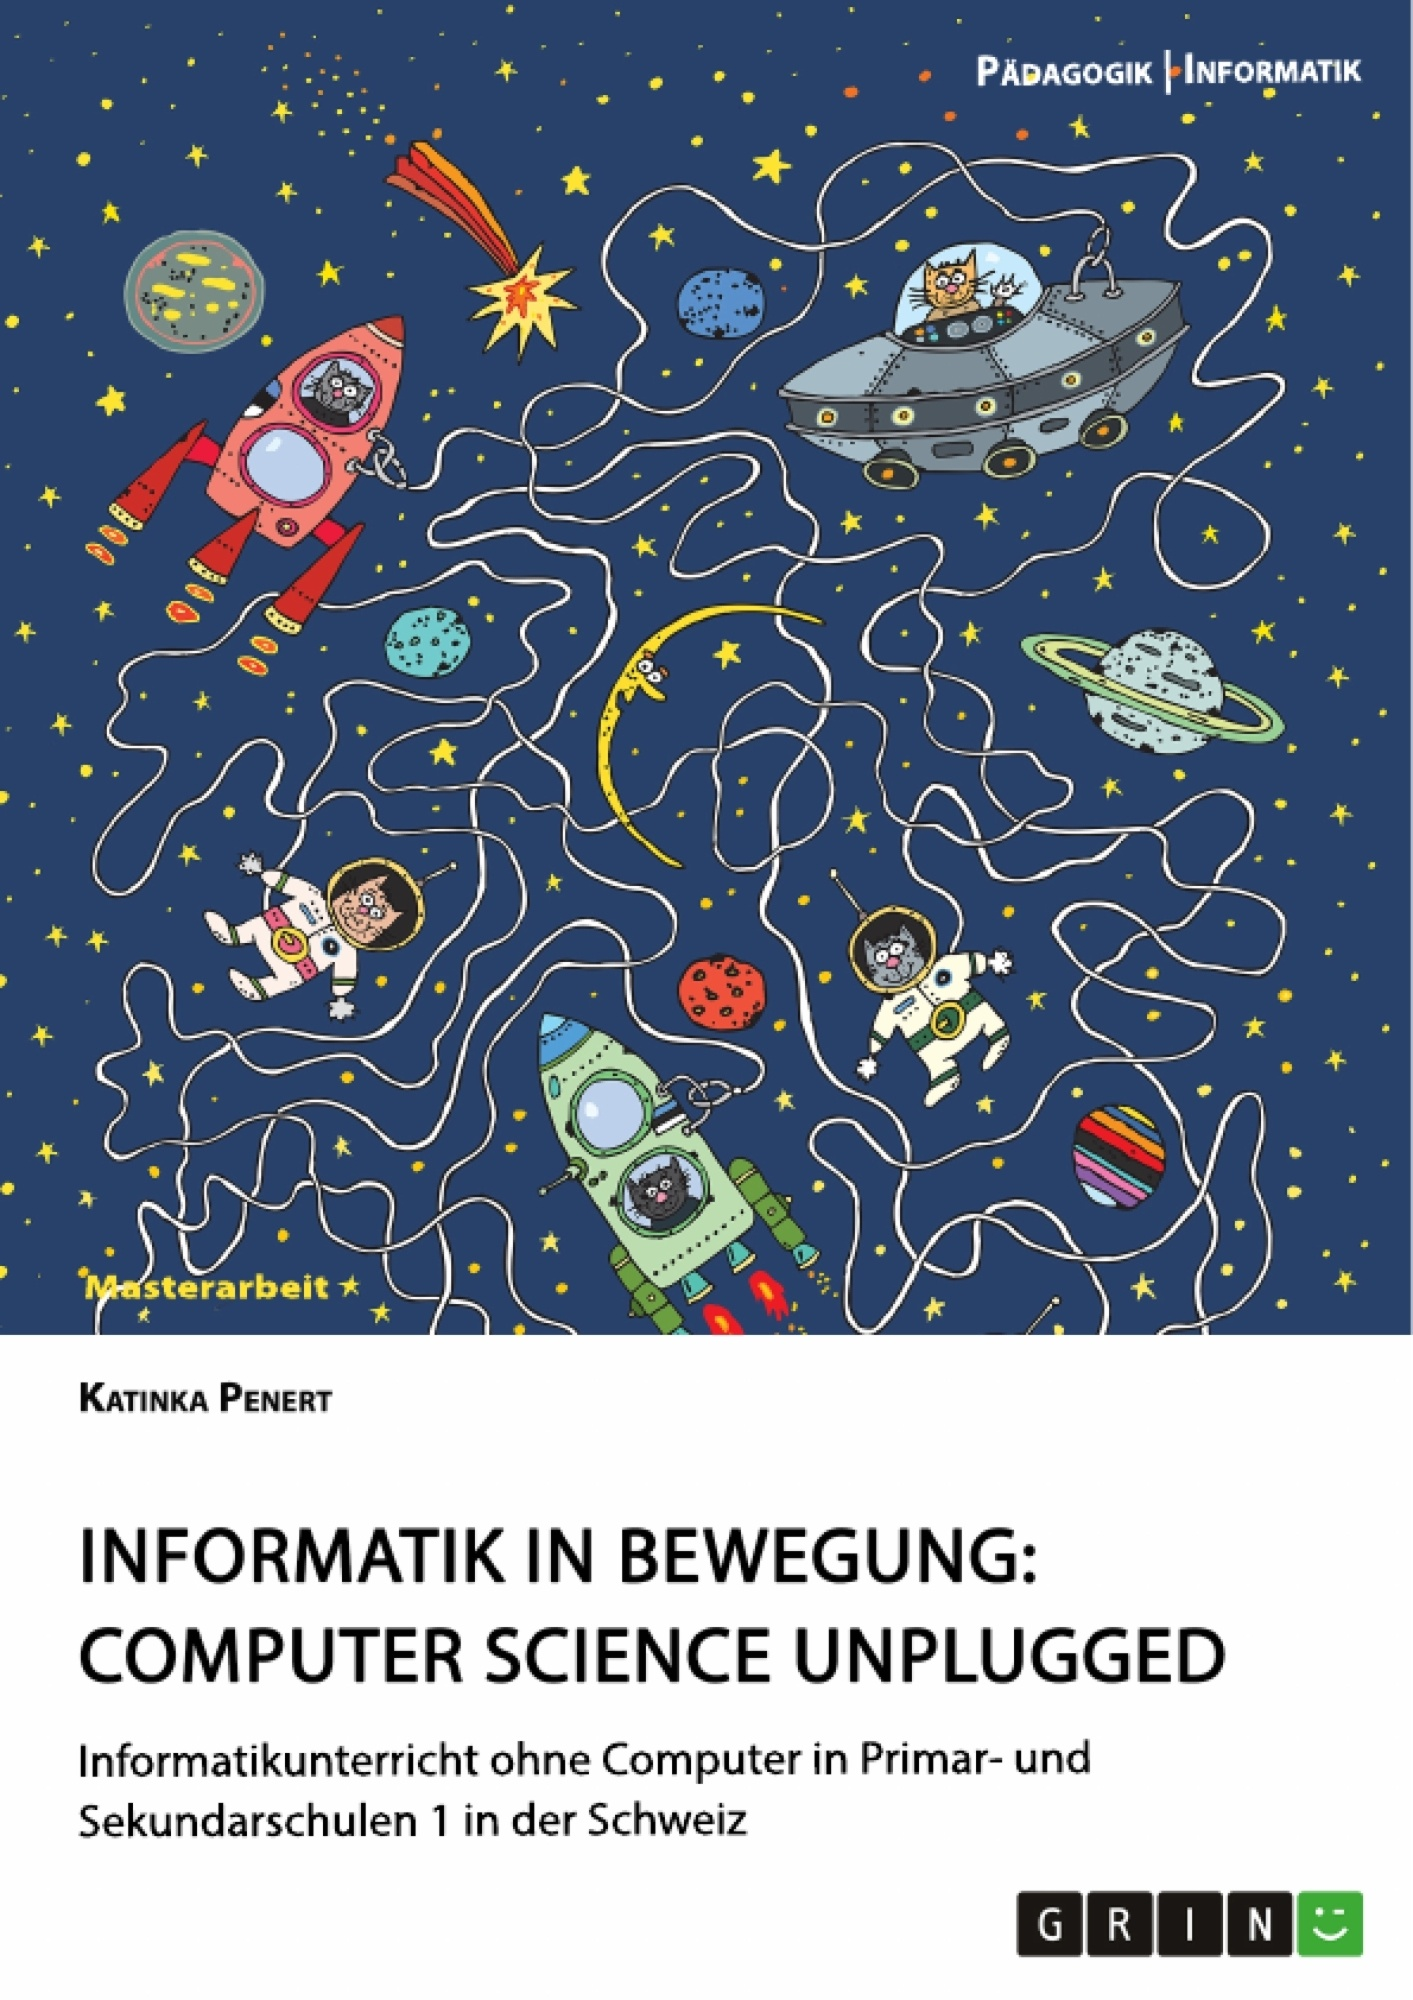 Titel: Informatik in Bewegung: Computer Science unplugged